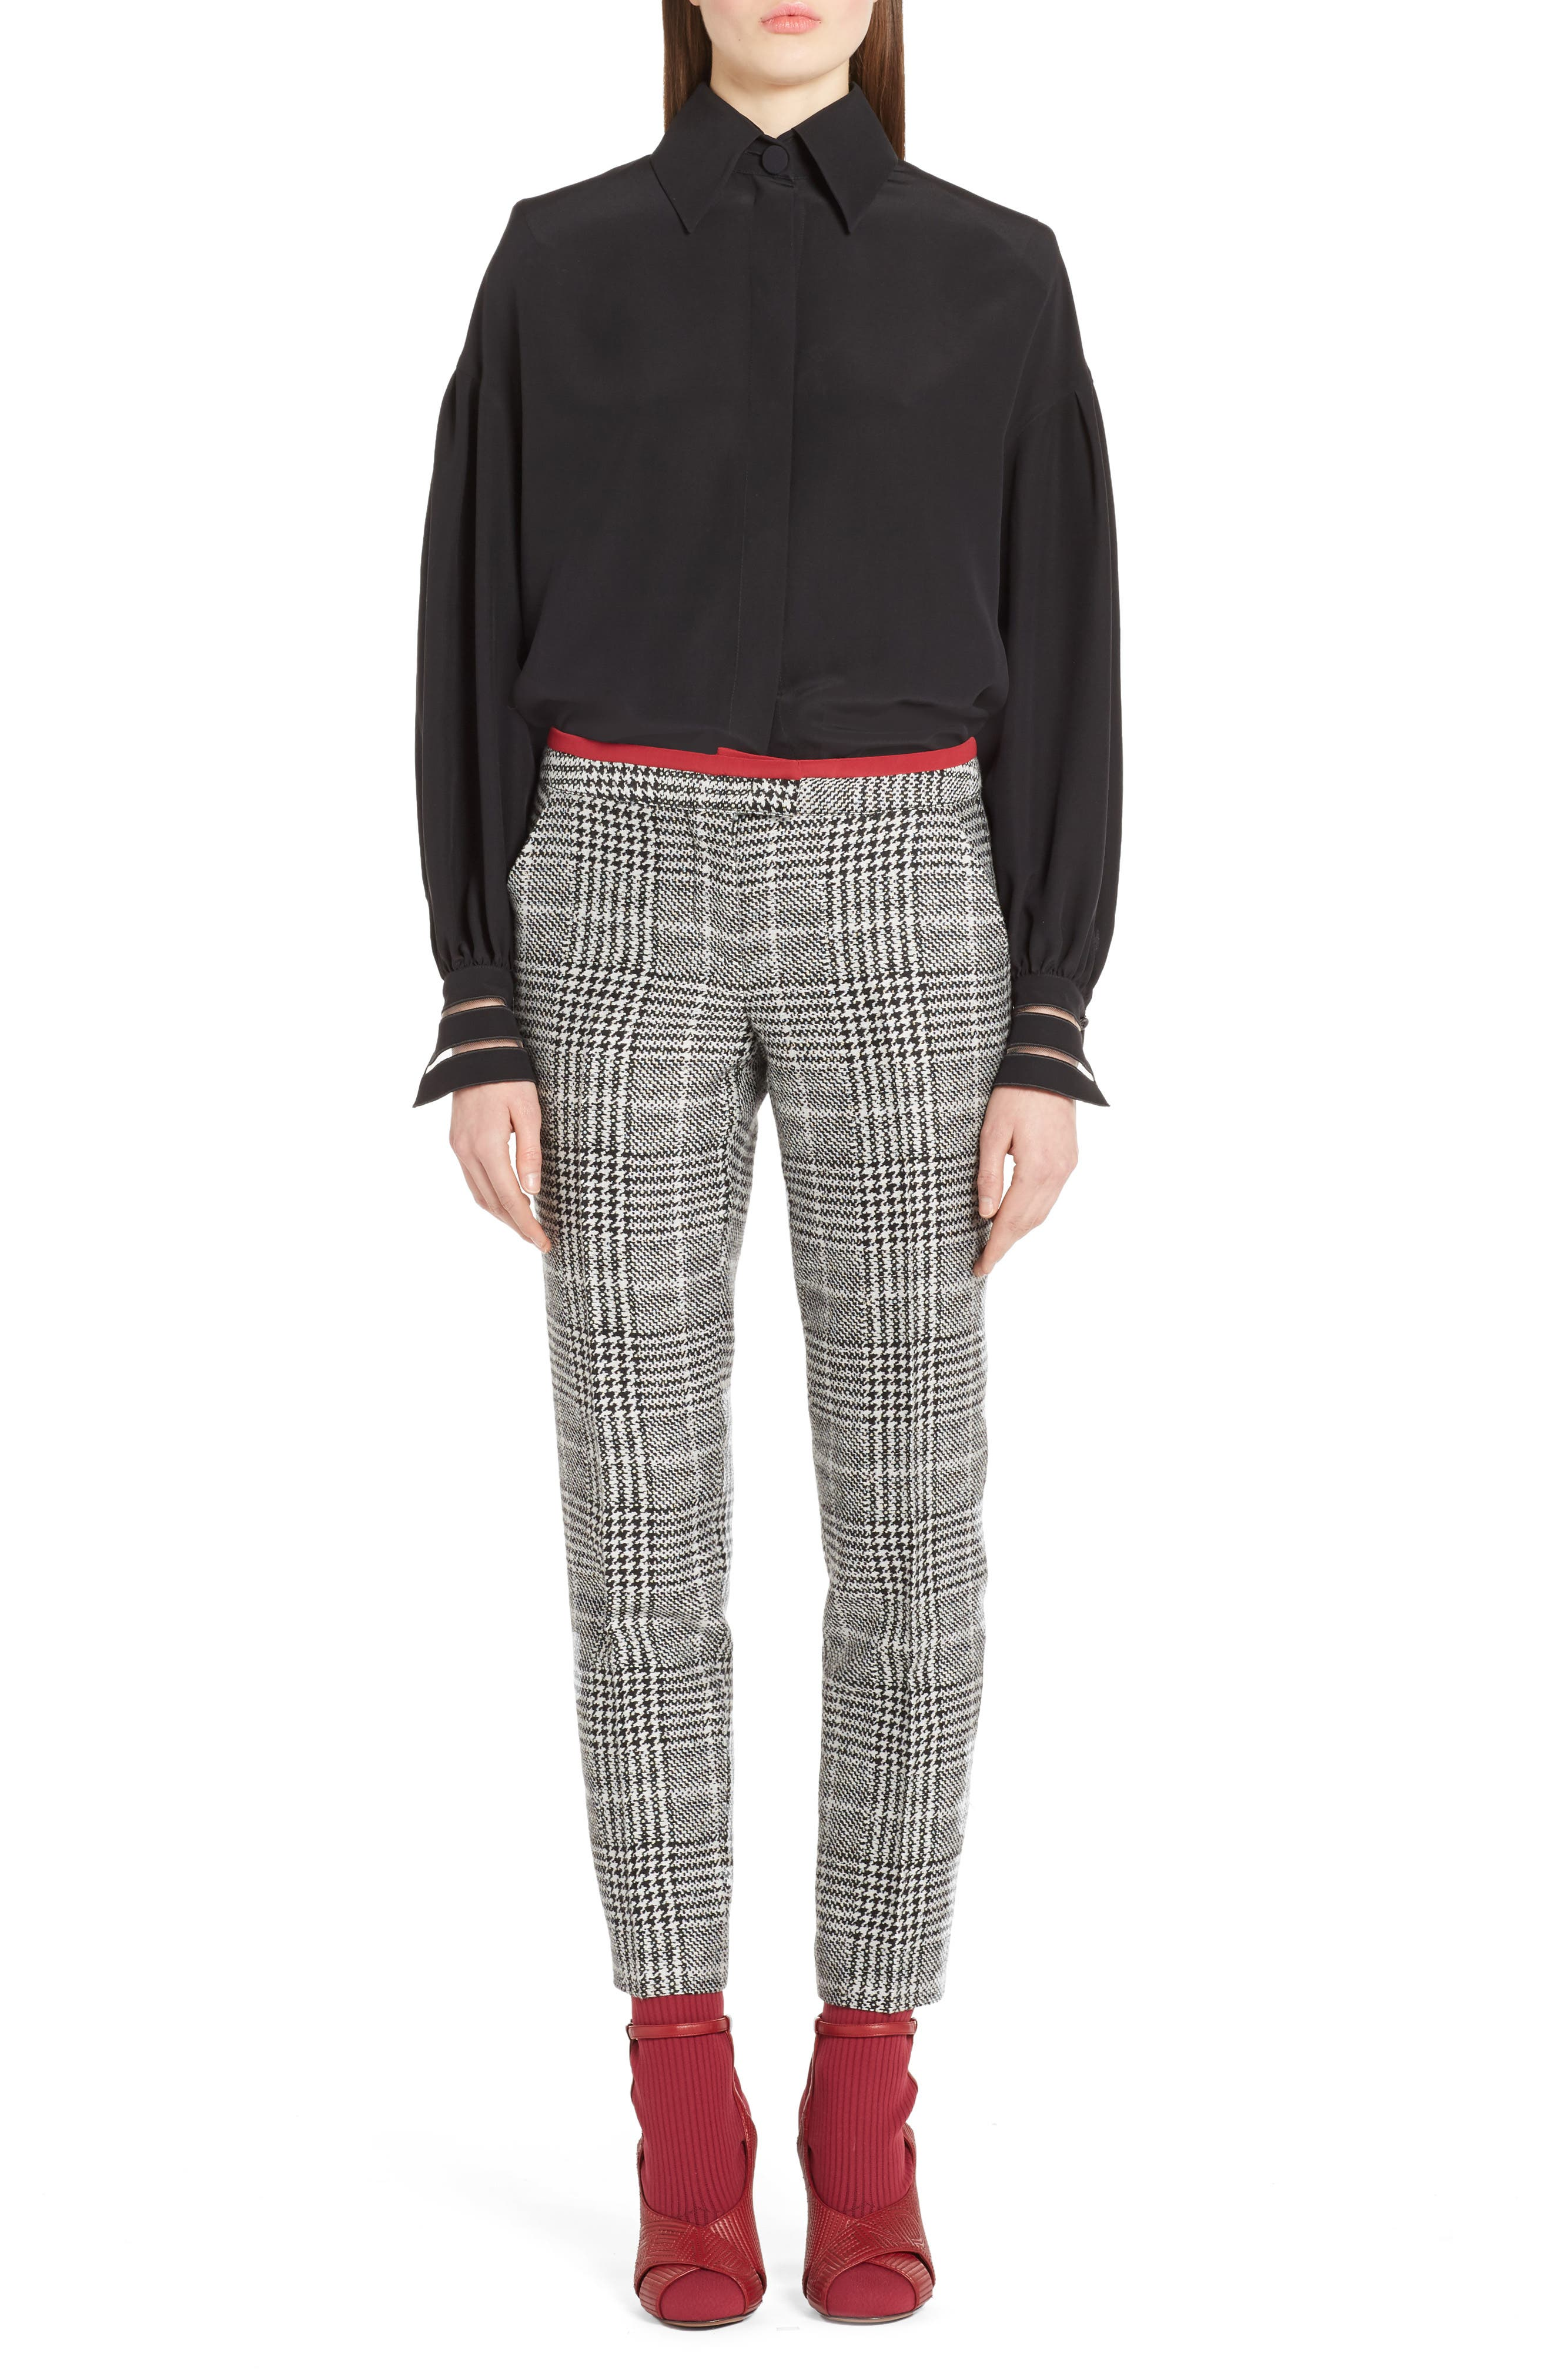 Prince of Wales Print Crop Pants,                             Alternate thumbnail 6, color,                             Black/ White